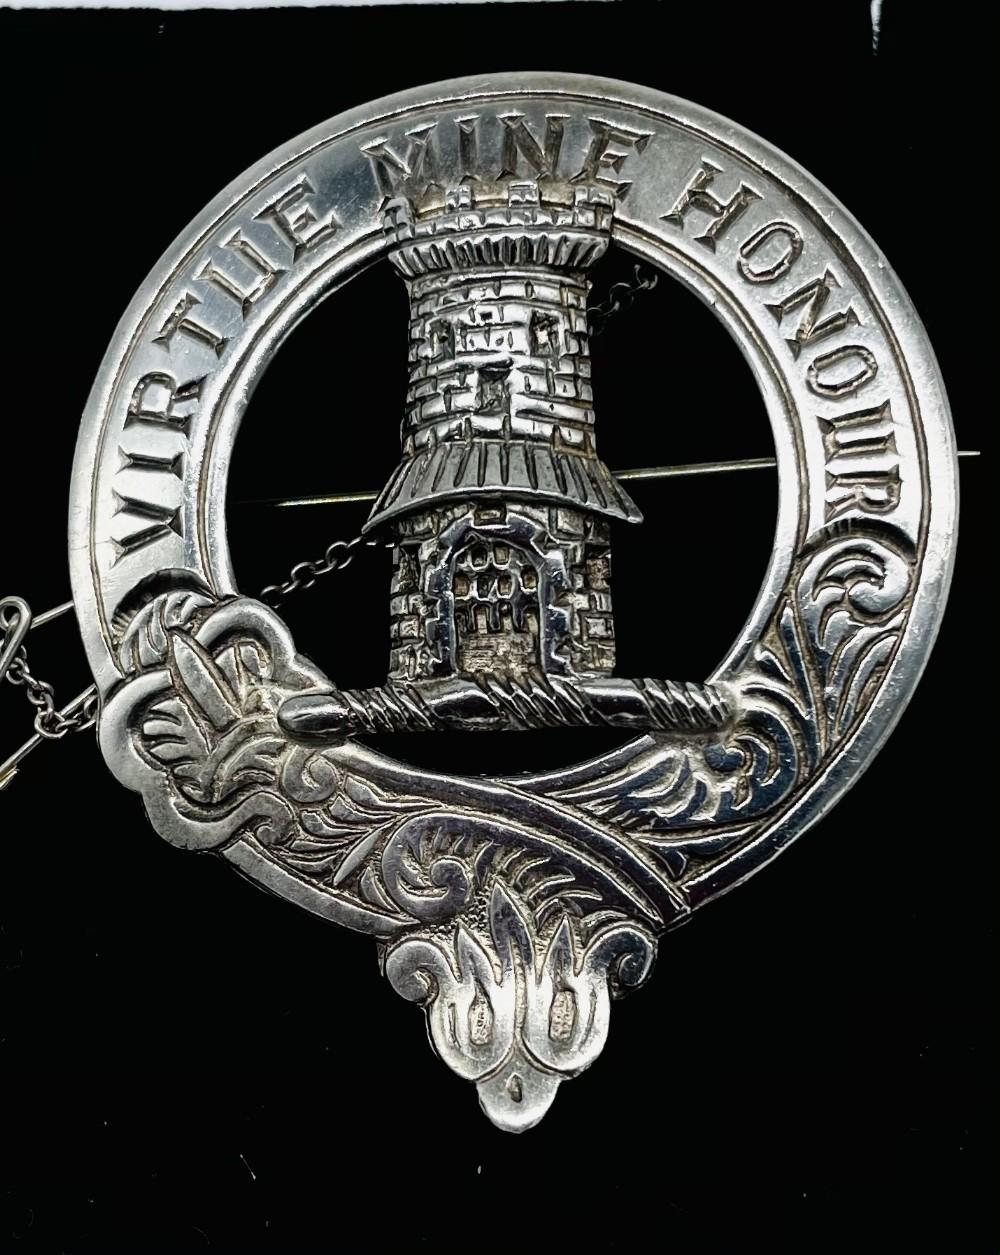 quality edinburgh solid silver mclean clan brooch hallmarked edinburgh 1969 john fraser